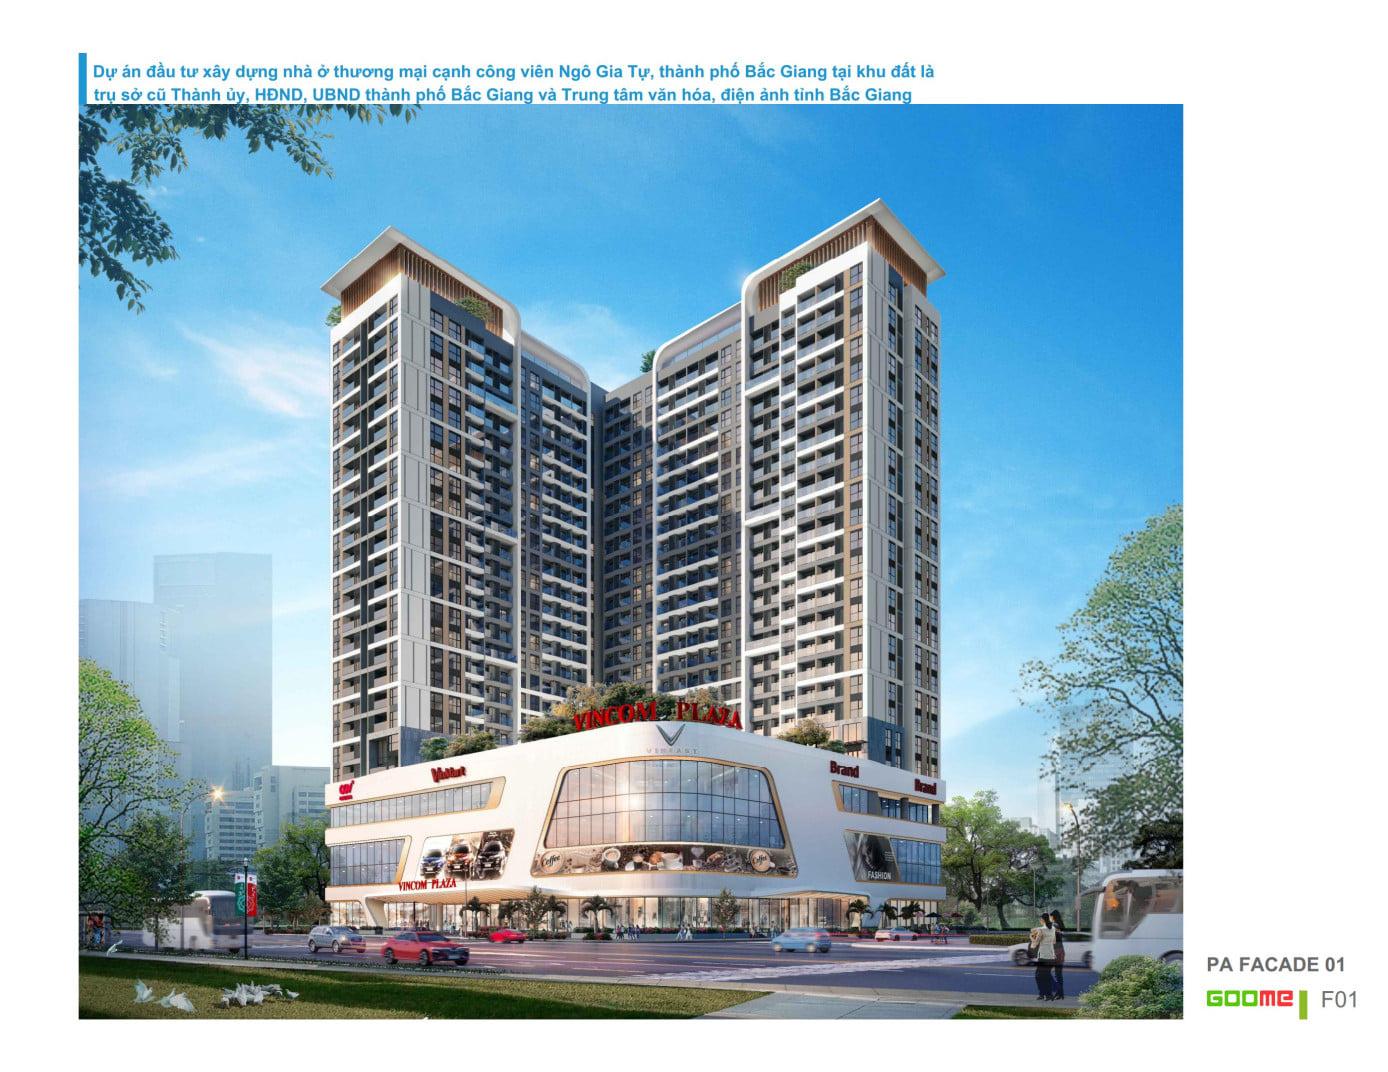 Dự án Vincom Shophouse Bắc Giang